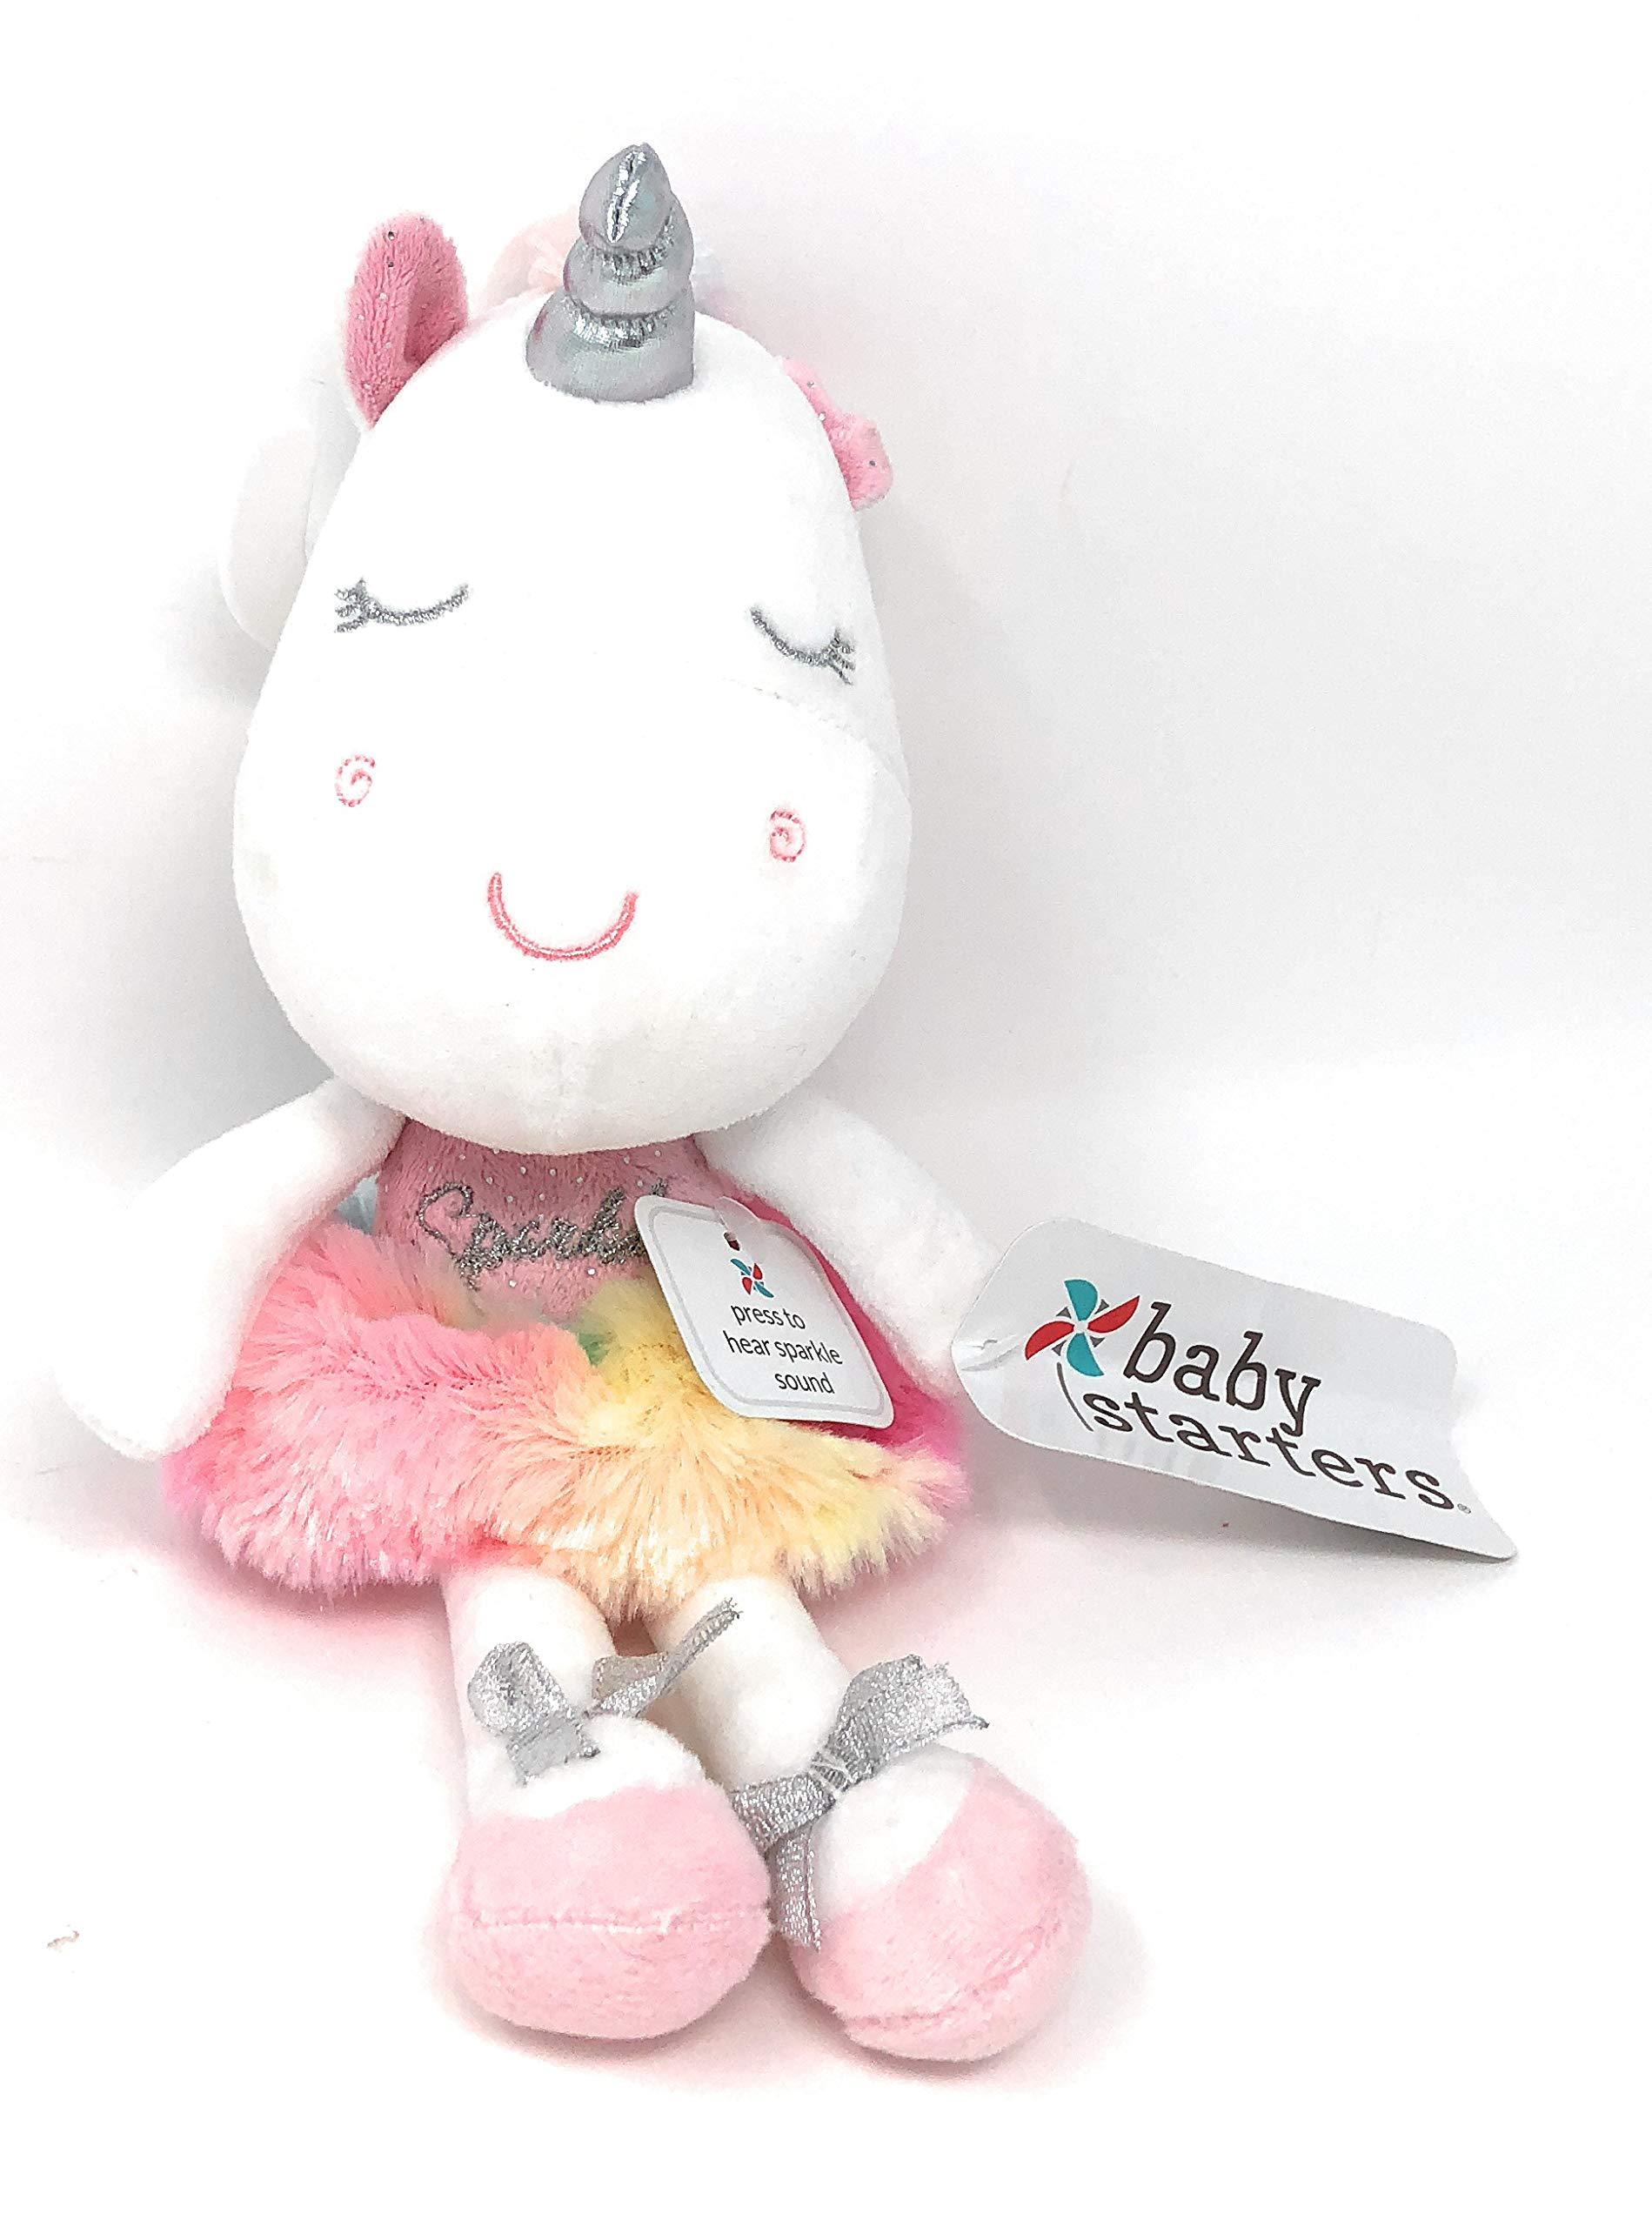 Baby Starters Ballet Tutu Rainbow Plush Unicorn ~ Dancing Ballerina | Press My Tummy to Hear Sparkle Sound | 12 in Tall